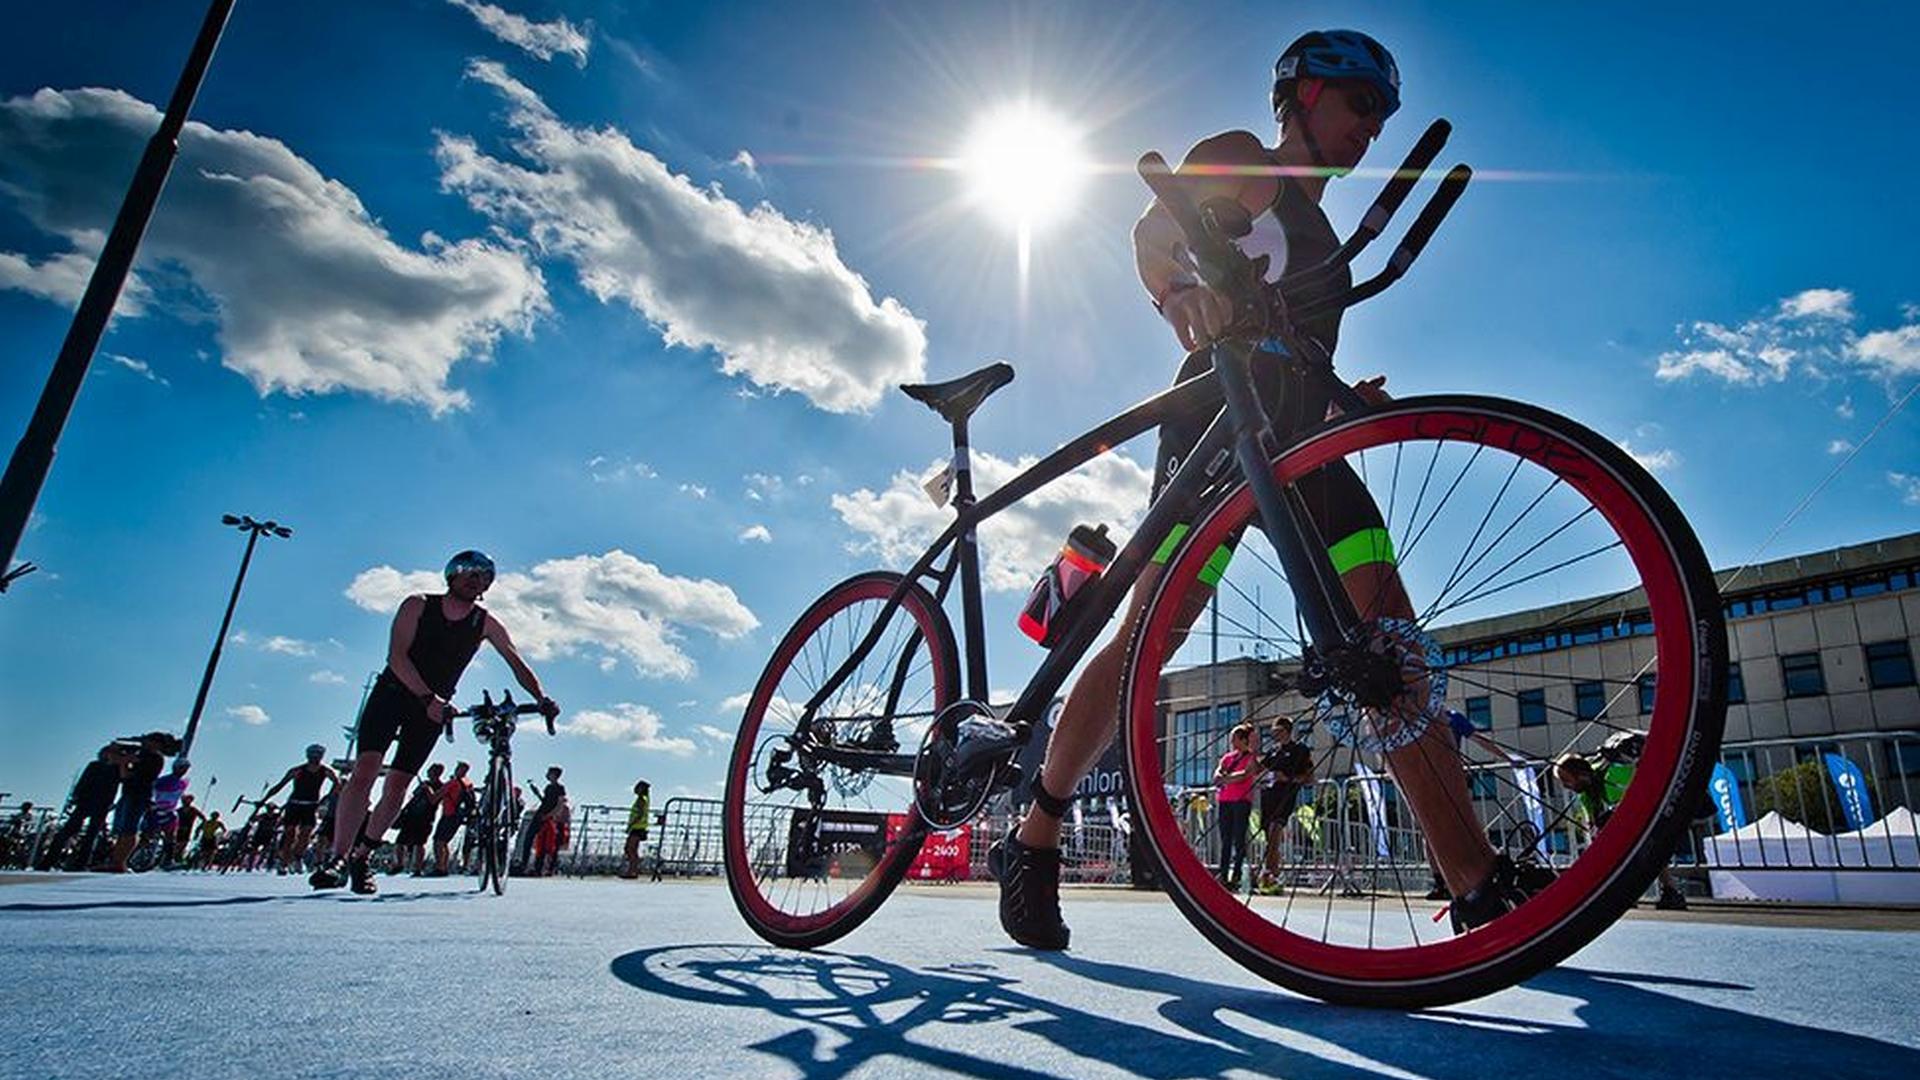 Enea Ironman Gdynia_Fot. Sportografia.pl_Sportevolution.jpg